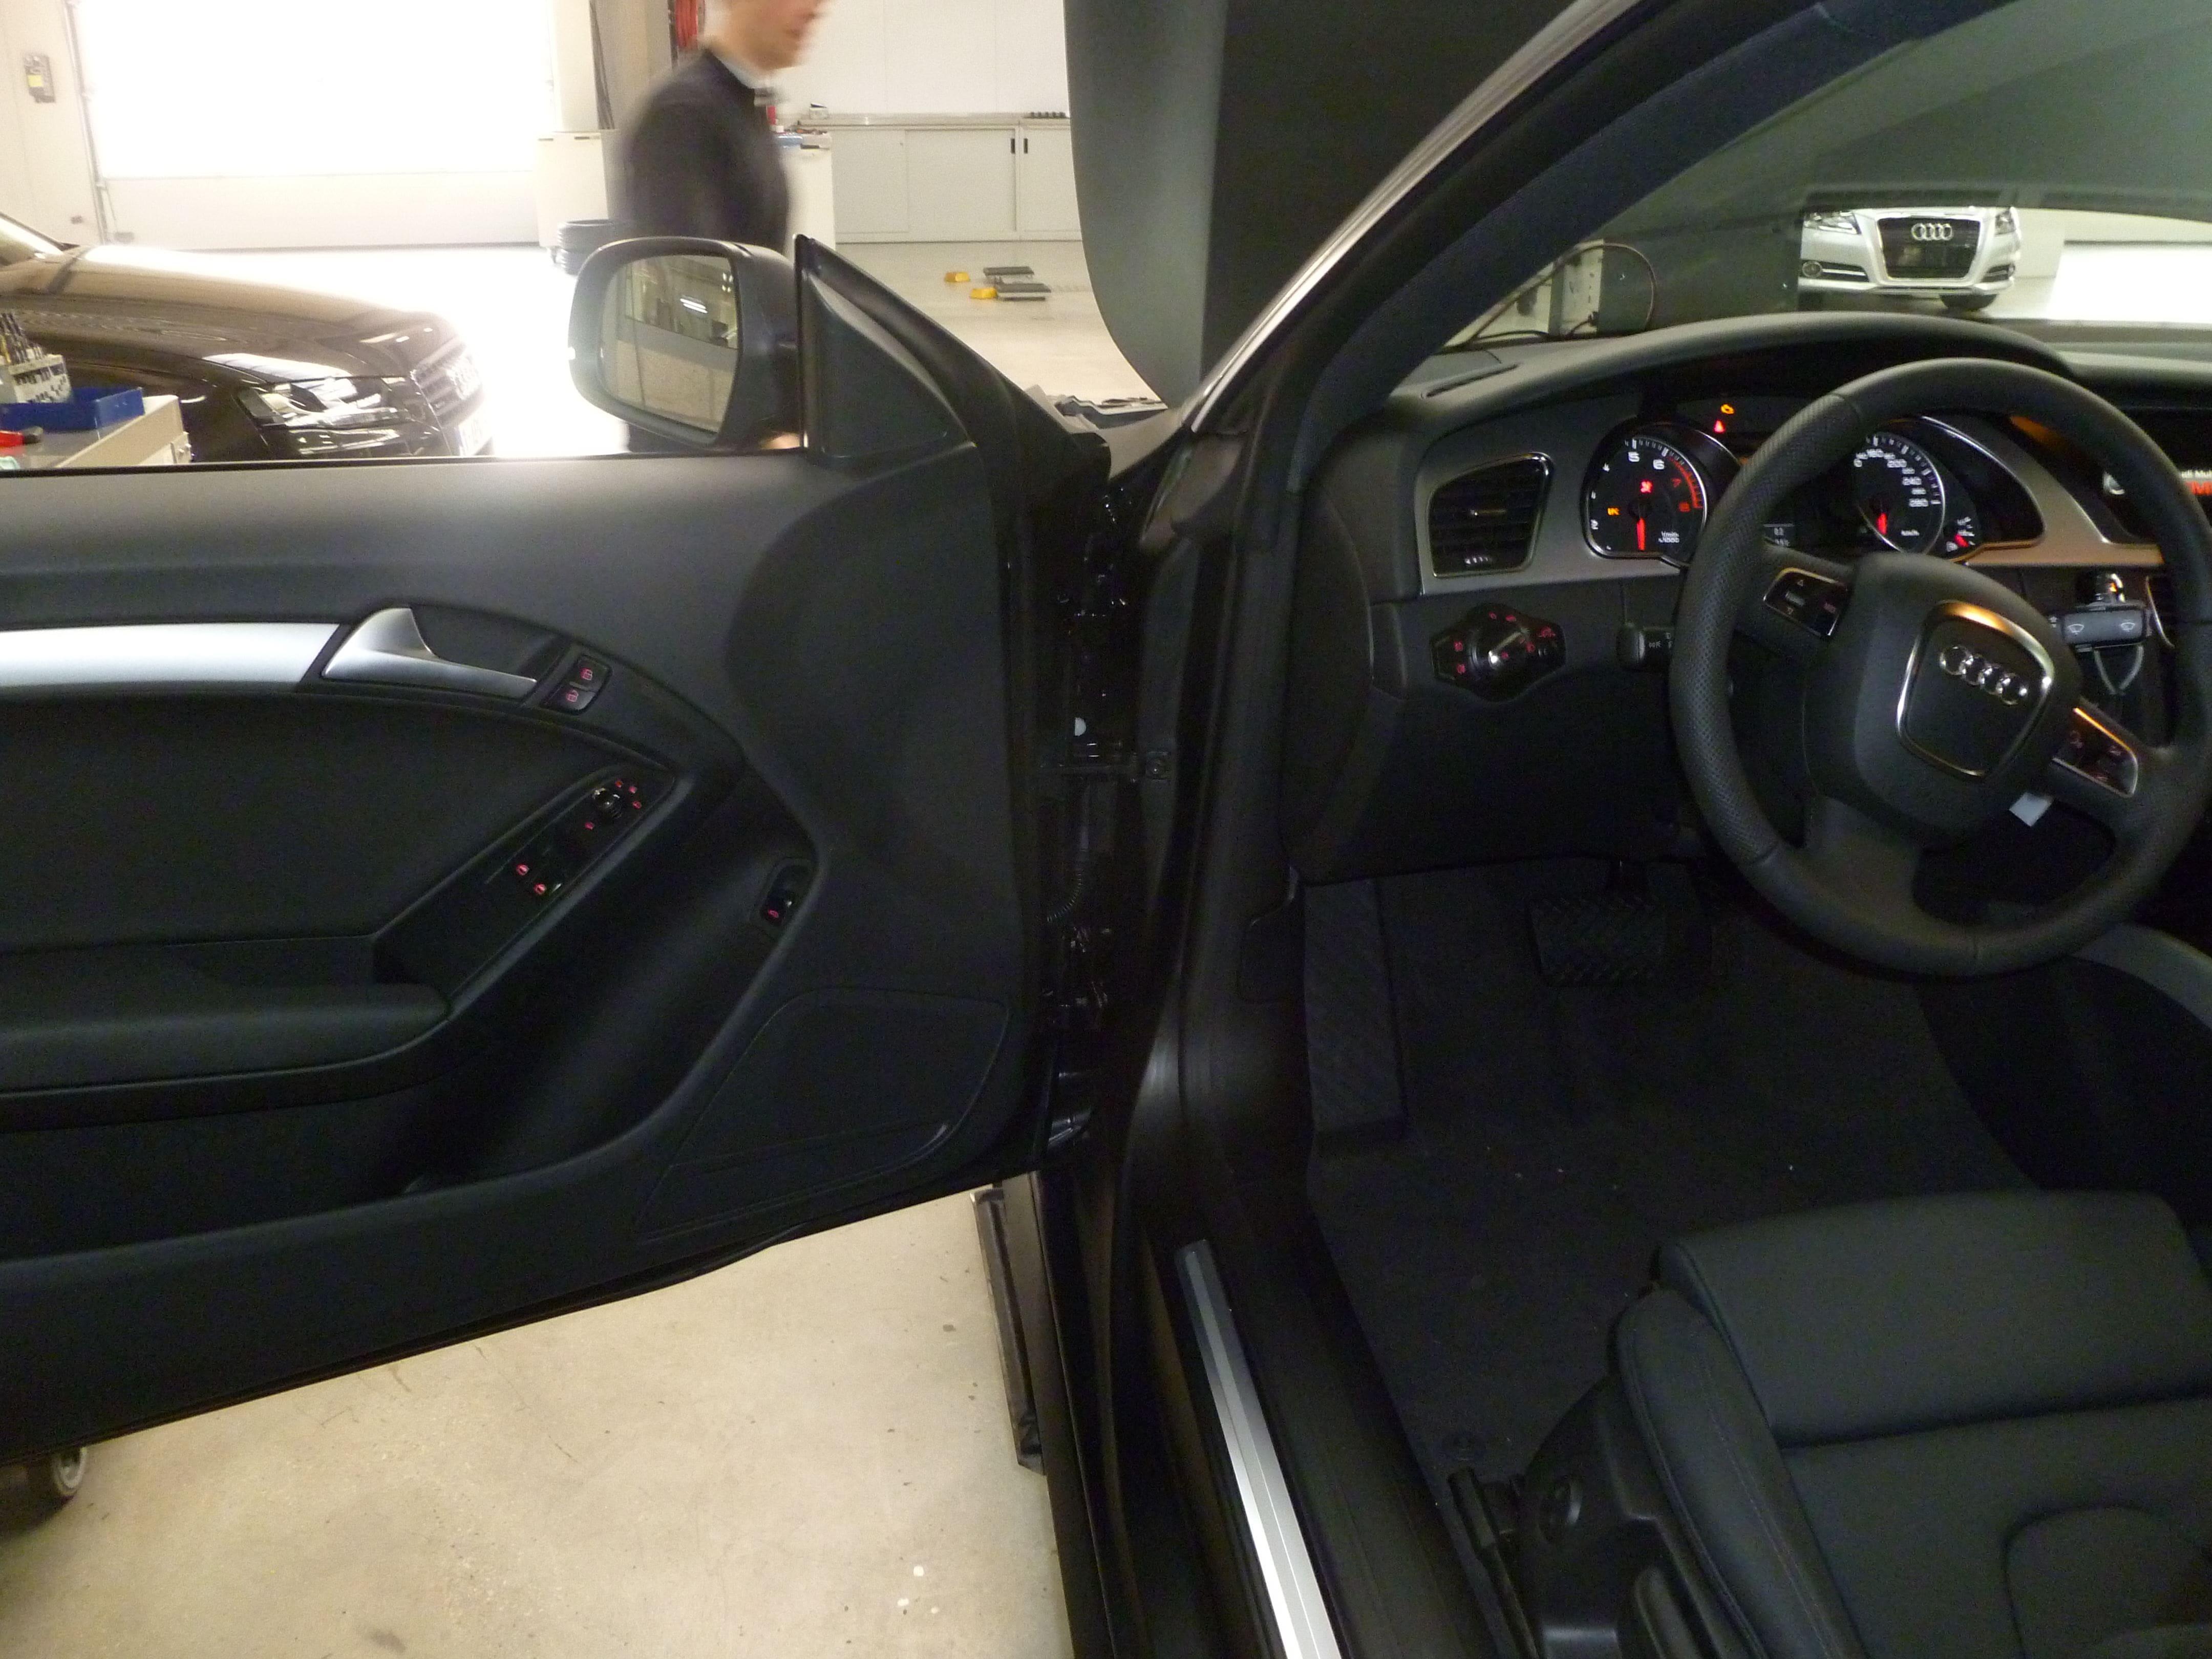 Audi A5 Coupe met Mat Zwarte Wrap, Carwrapping door Wrapmyride.nu Foto-nr:4658, ©2021